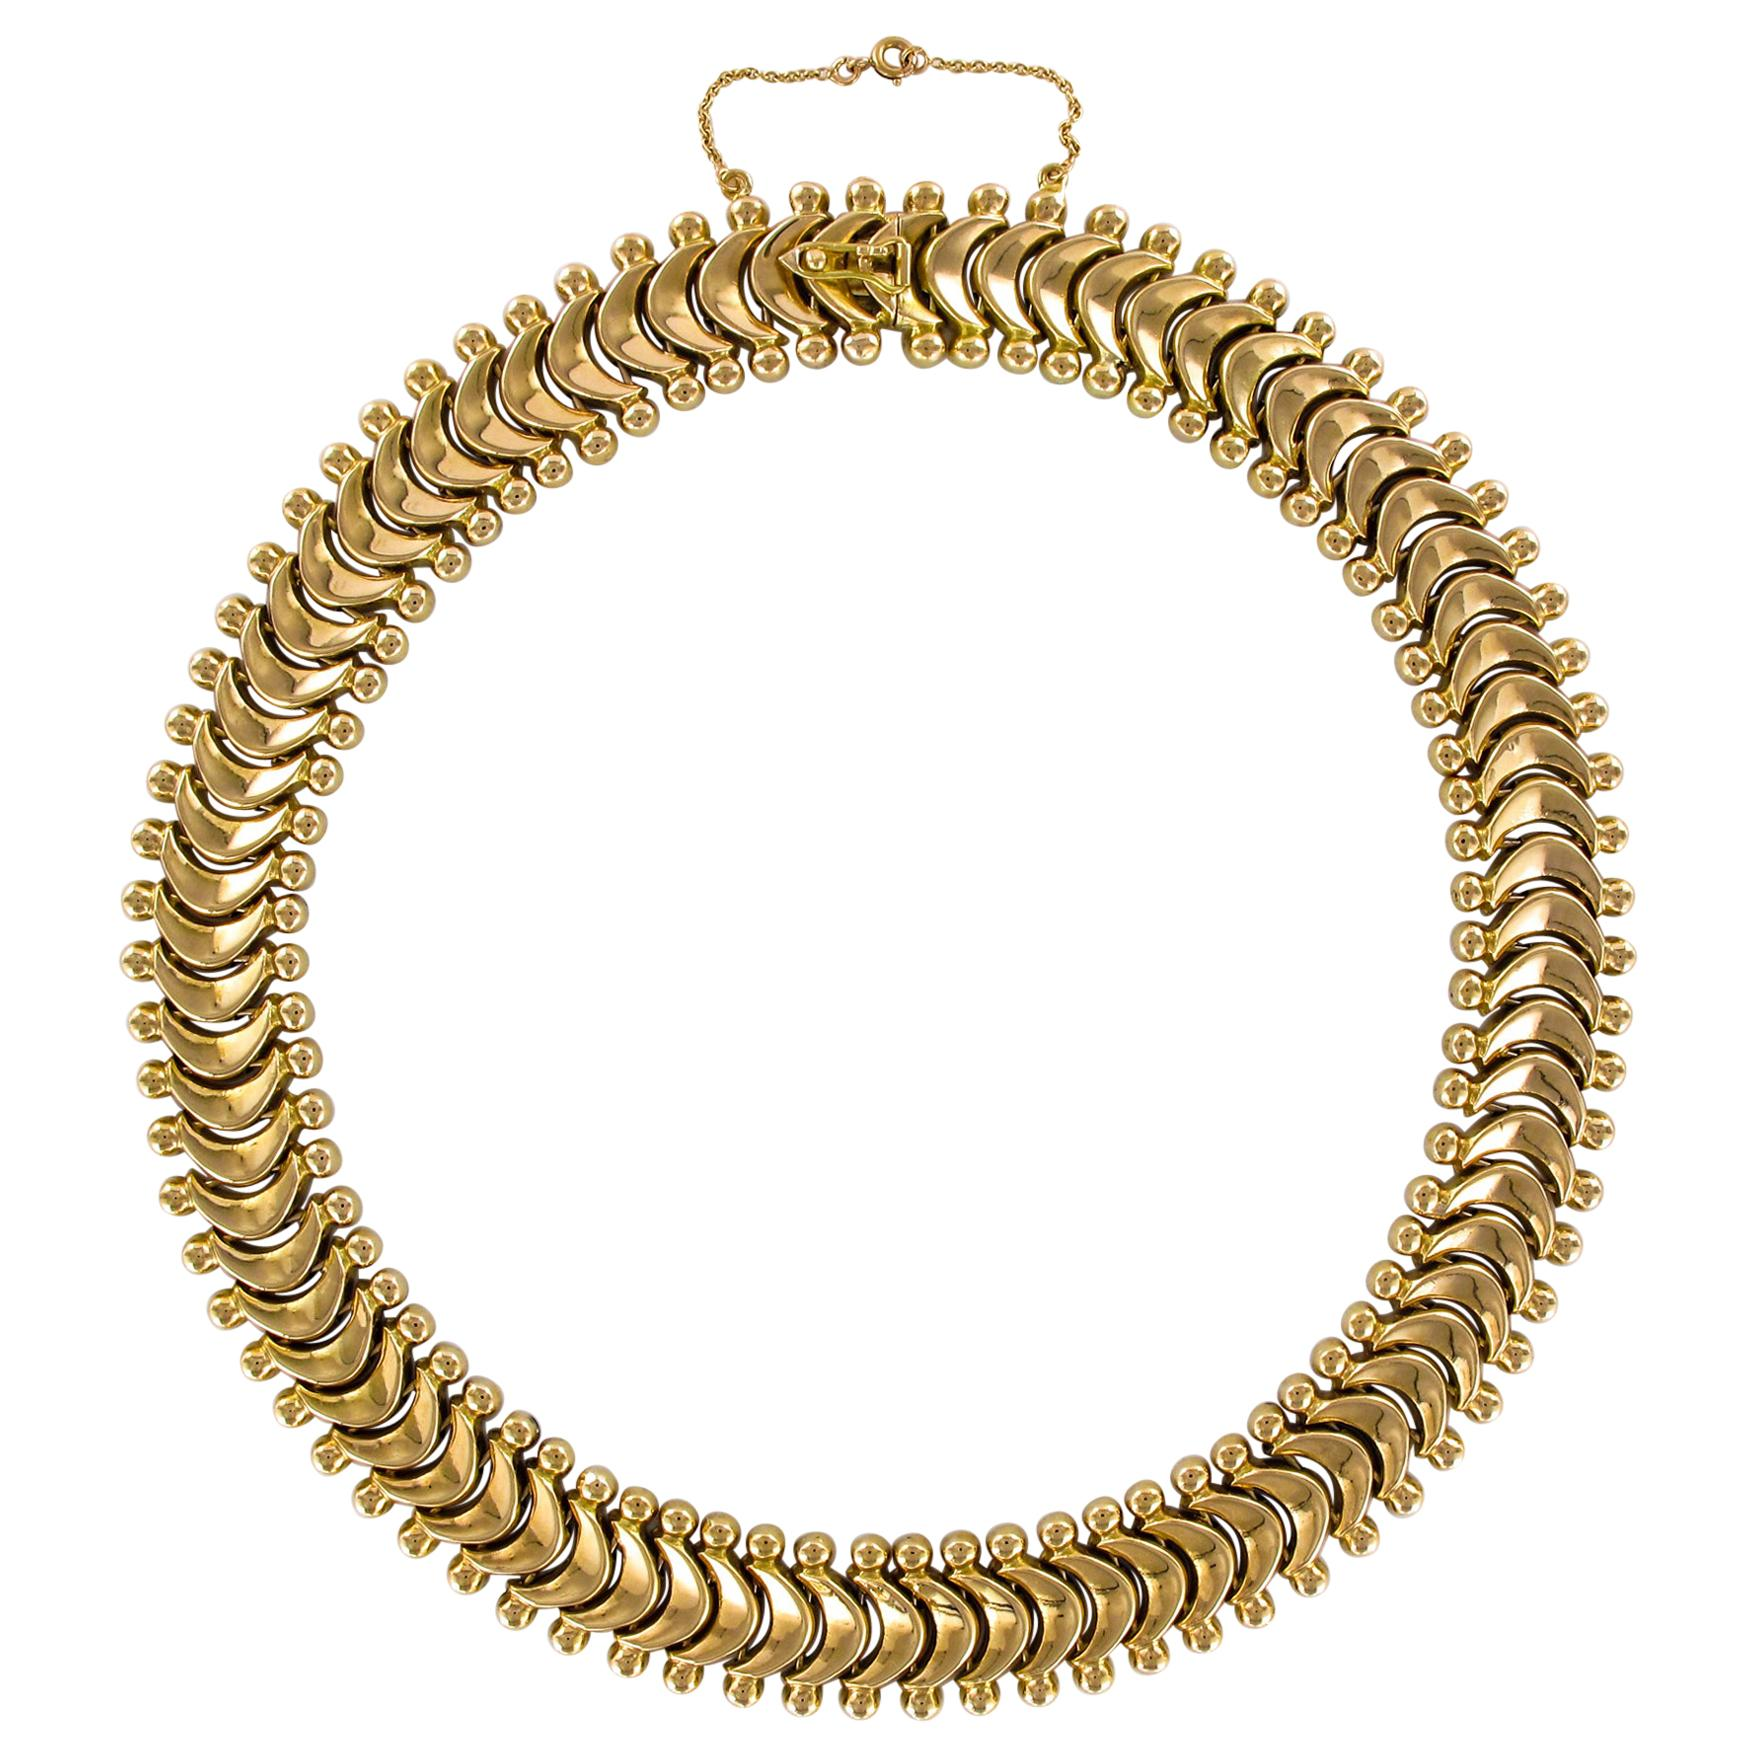 1950s Retro 18 Karat Yellow Gold Articulated Retro Necklace